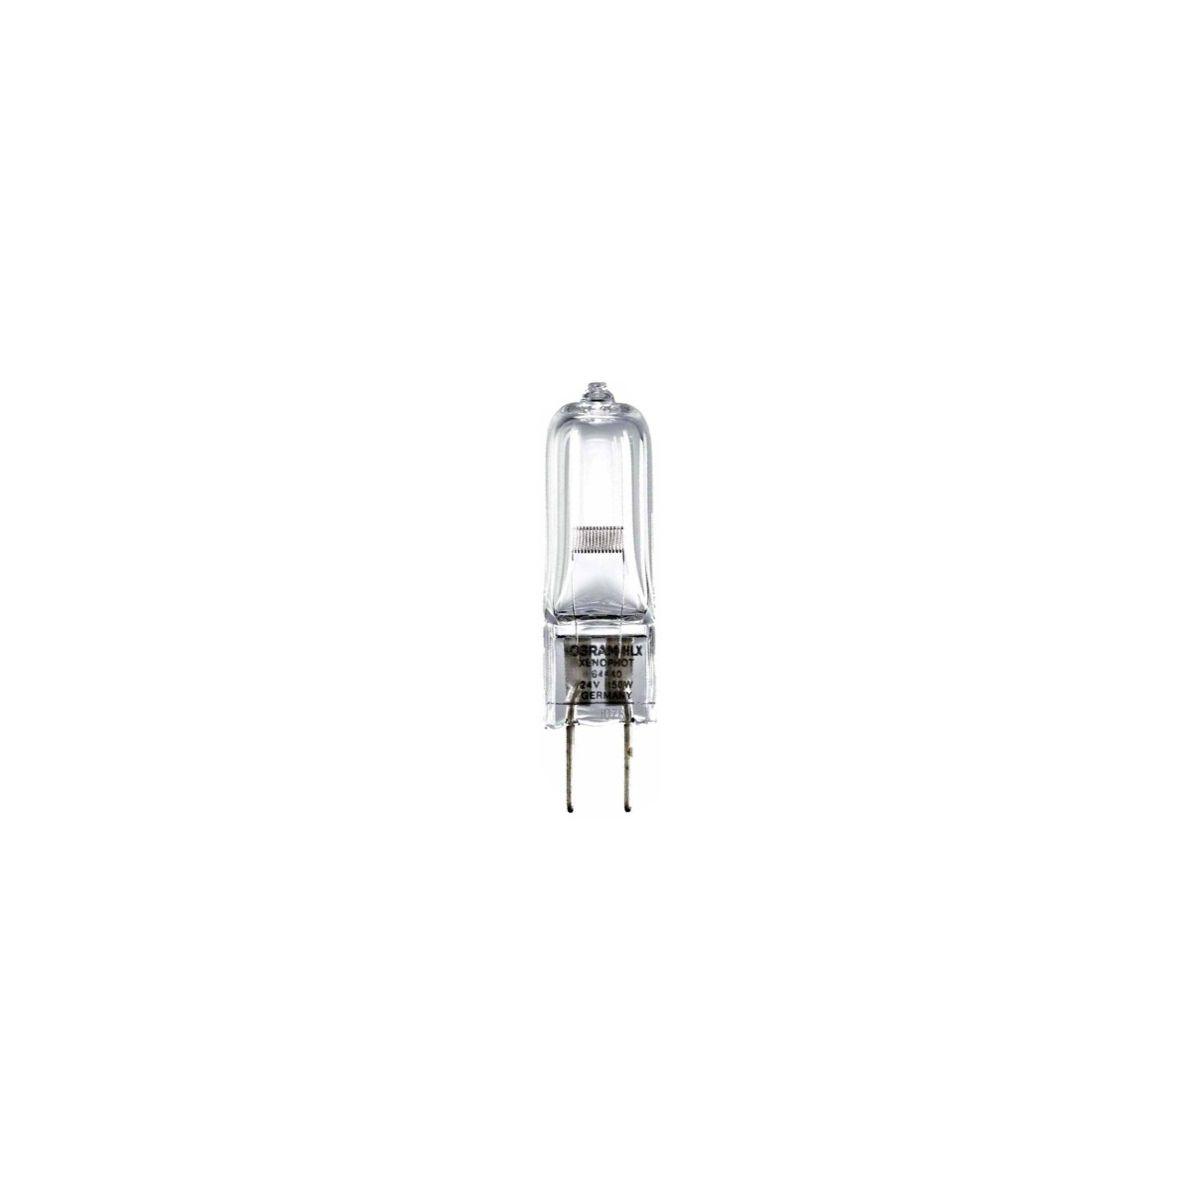 Ampoules halogènes - Osram / GE / Philips - FCS 24V 150W